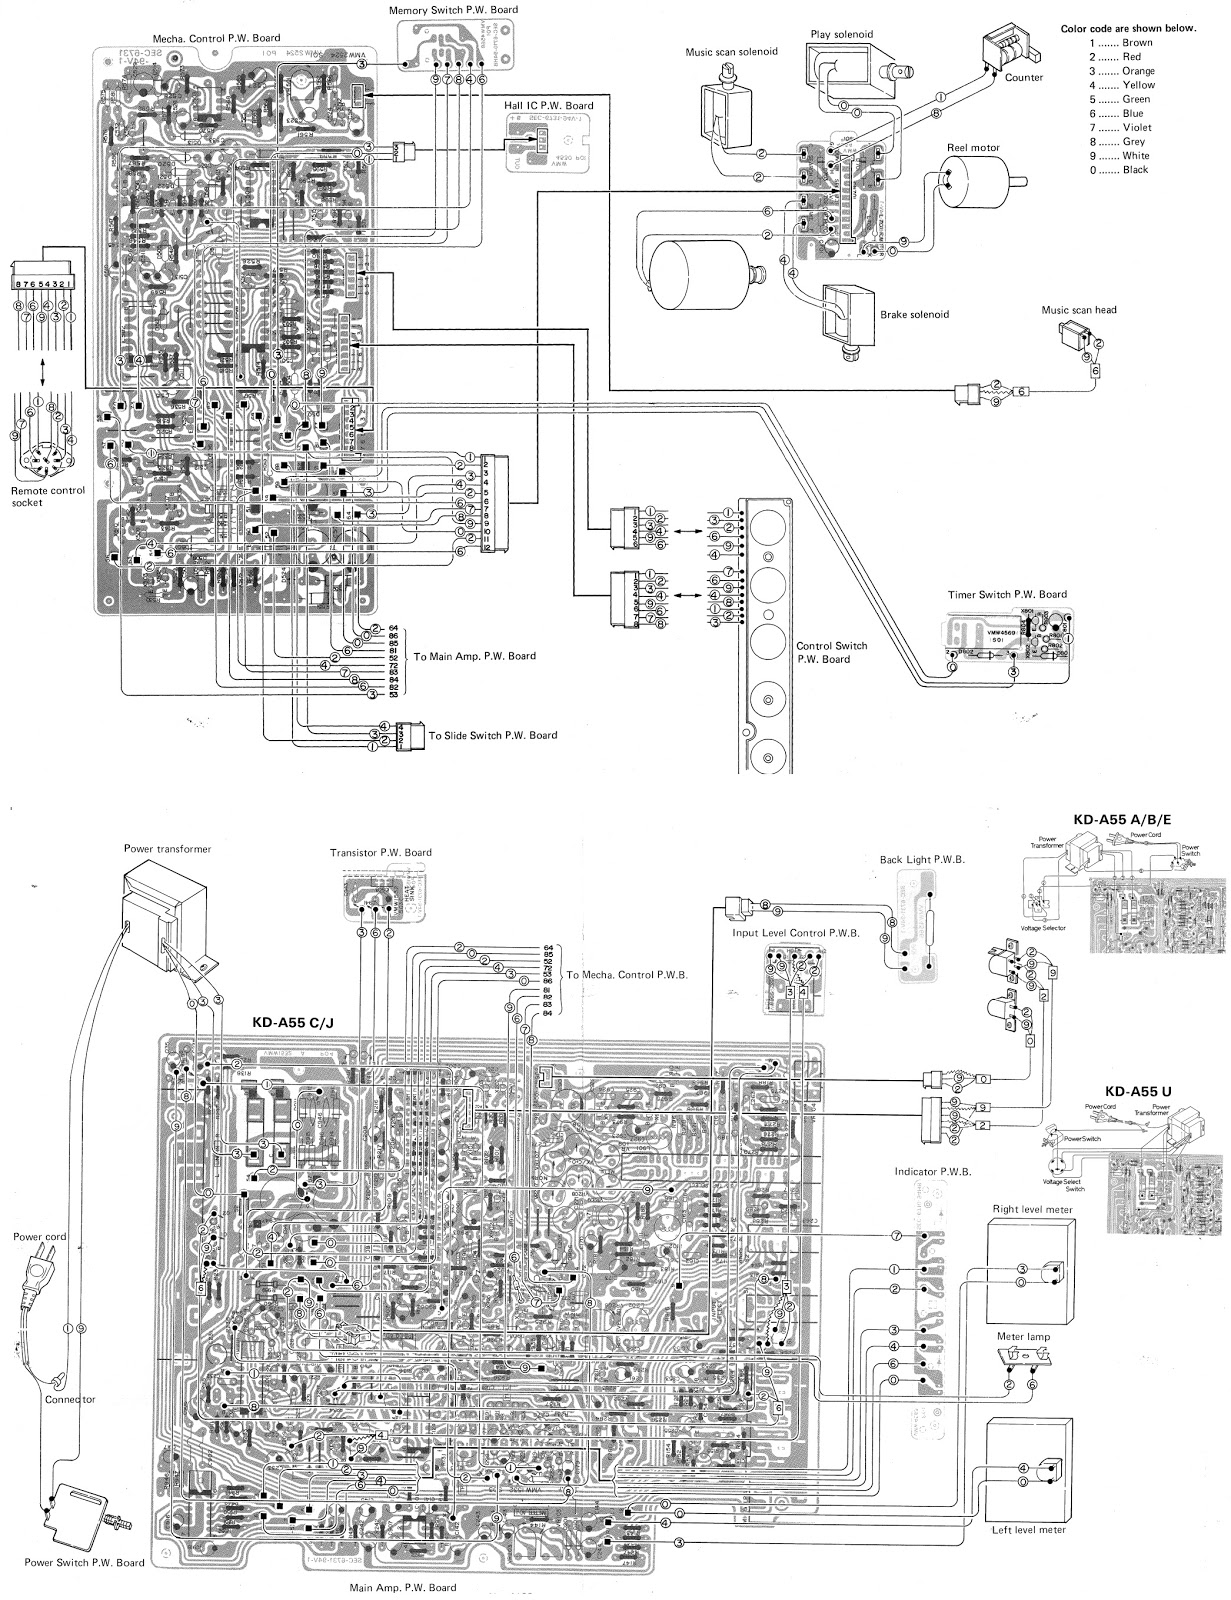 medium resolution of jvc deck wiring diagram 19 sg dbd de u2022jvc kd a55 gradient cd6500 tape deck